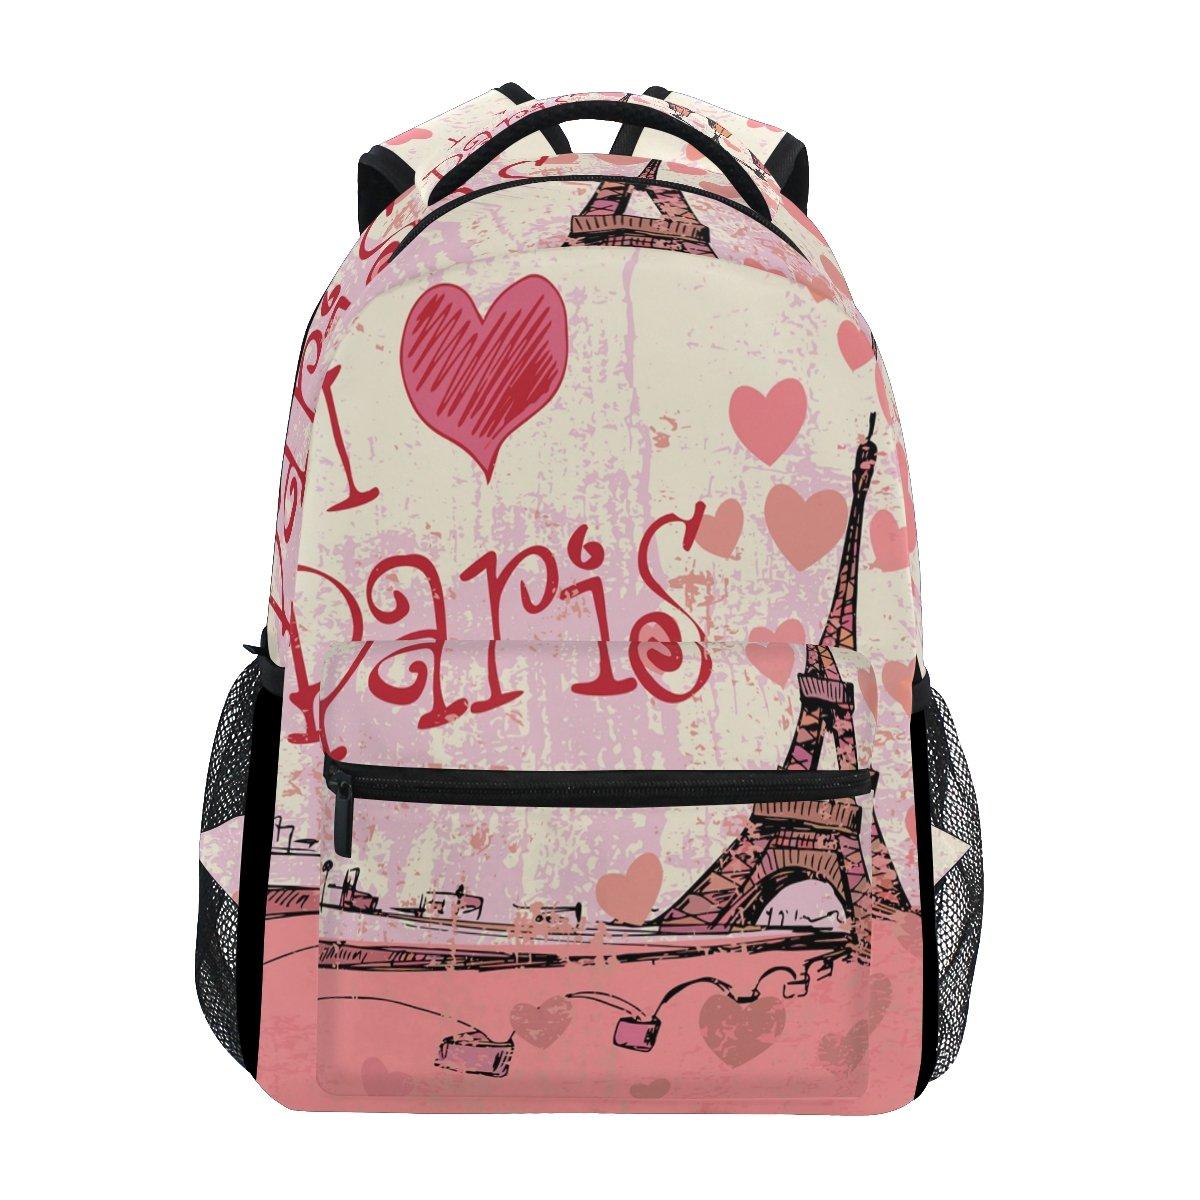 TropicalLife Eiffel Tower I Love Paris Backpacks School Bookbag Shoulder Backpack Hiking Travel Daypack Casual Bags